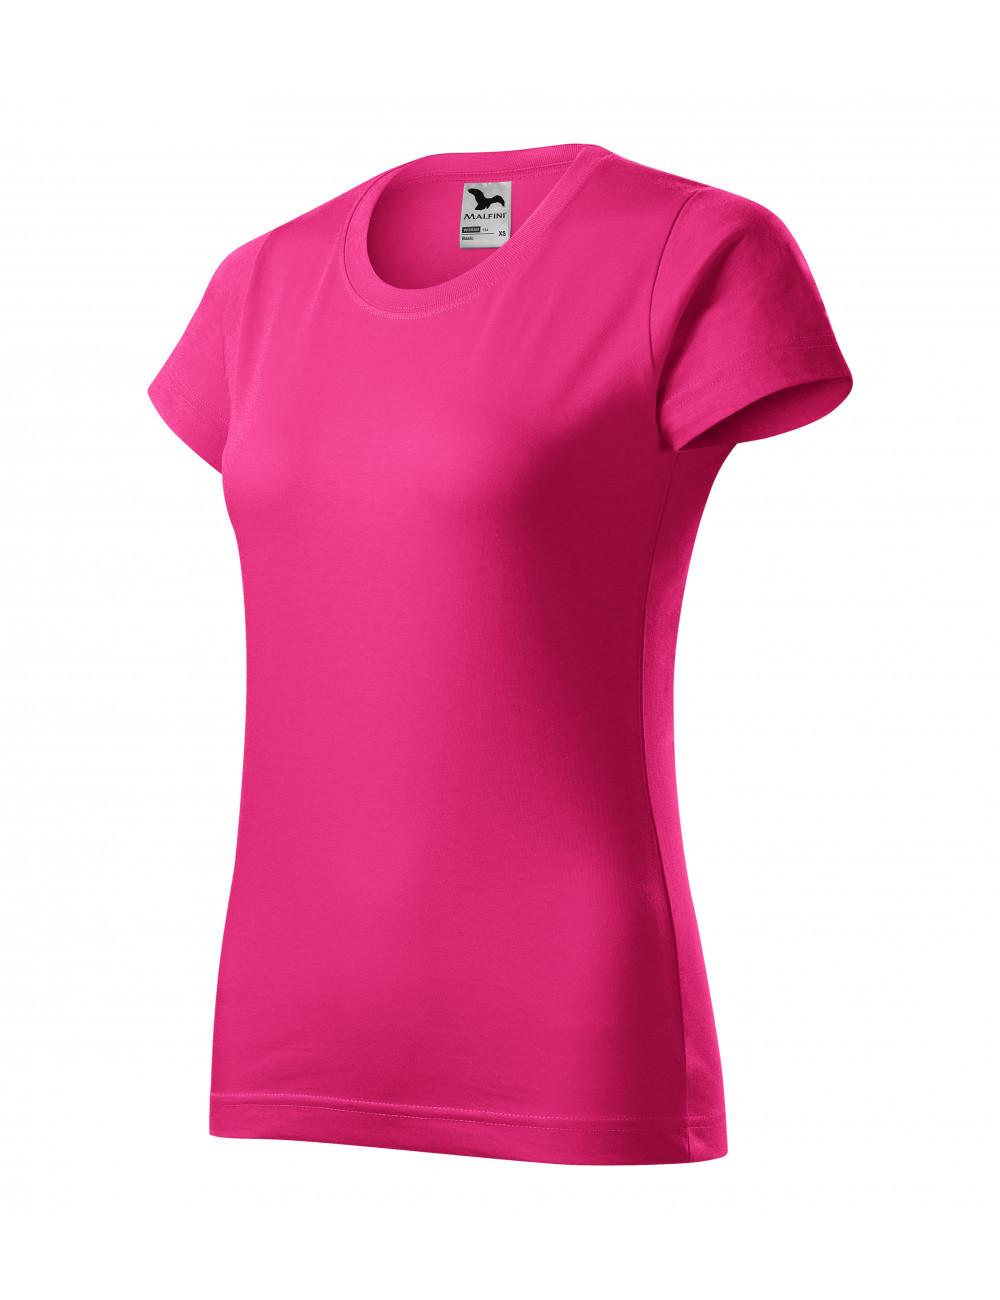 Adler MALFINI Koszulka damska Basic 134 czerwień purpurowa